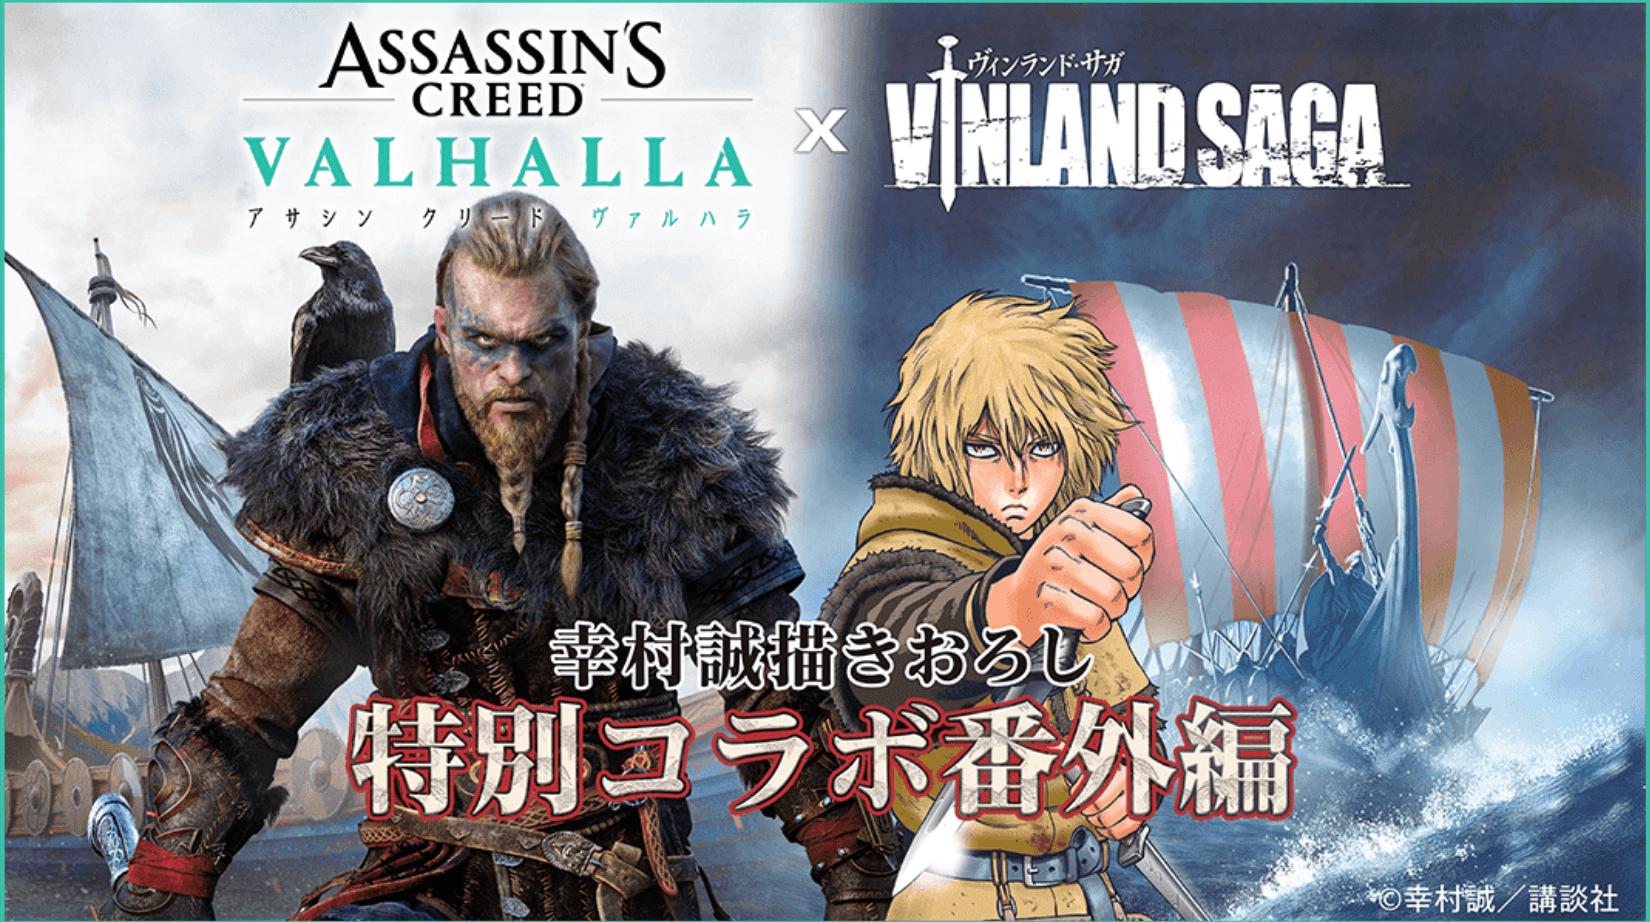 AC Valhalla X Vinland Saga Collaboration